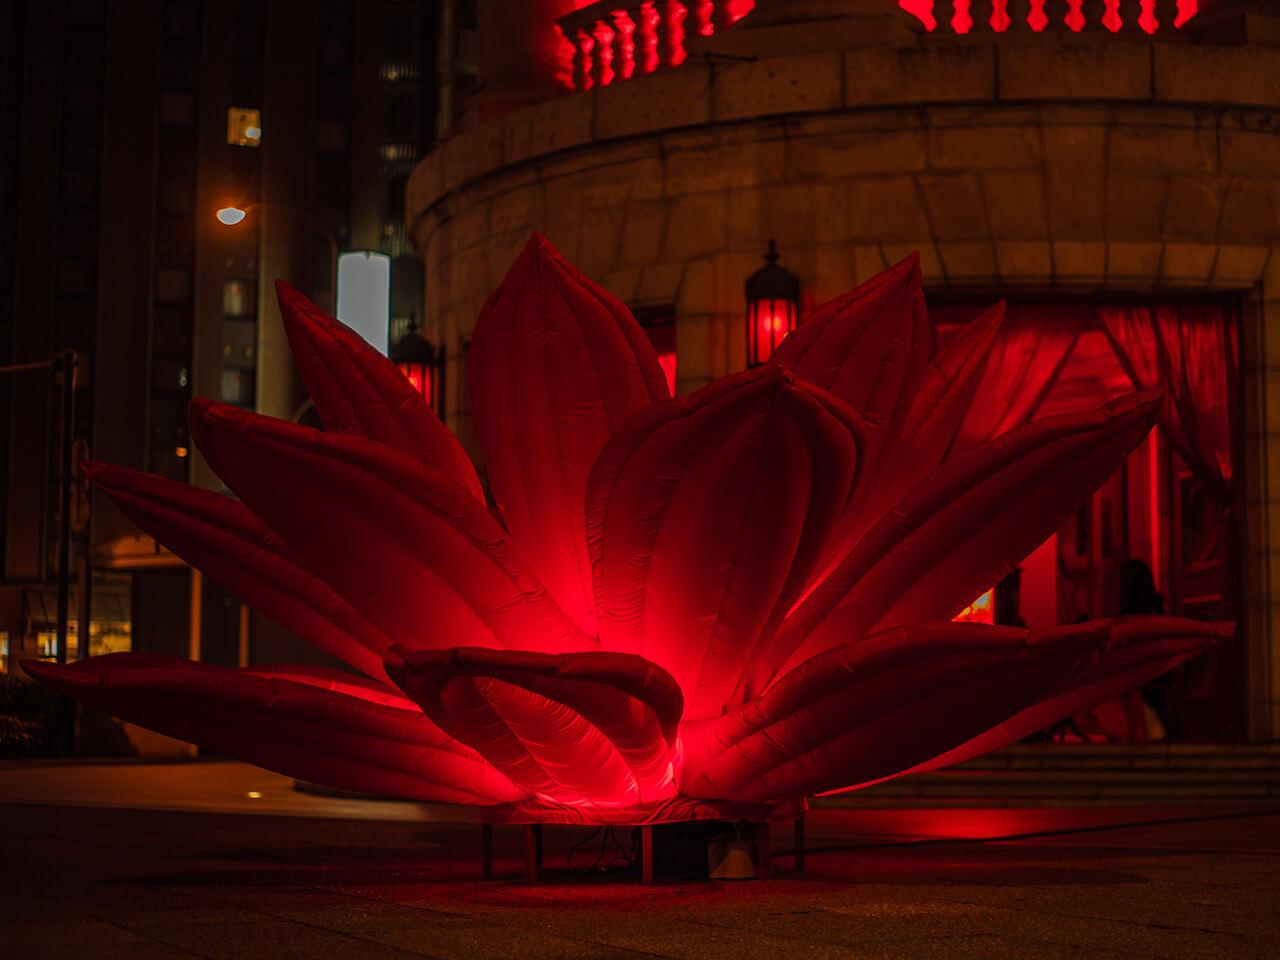 RED ROOM #2 開催風景 現代美術・アート Contemporary Art オフソサエティ offsociety